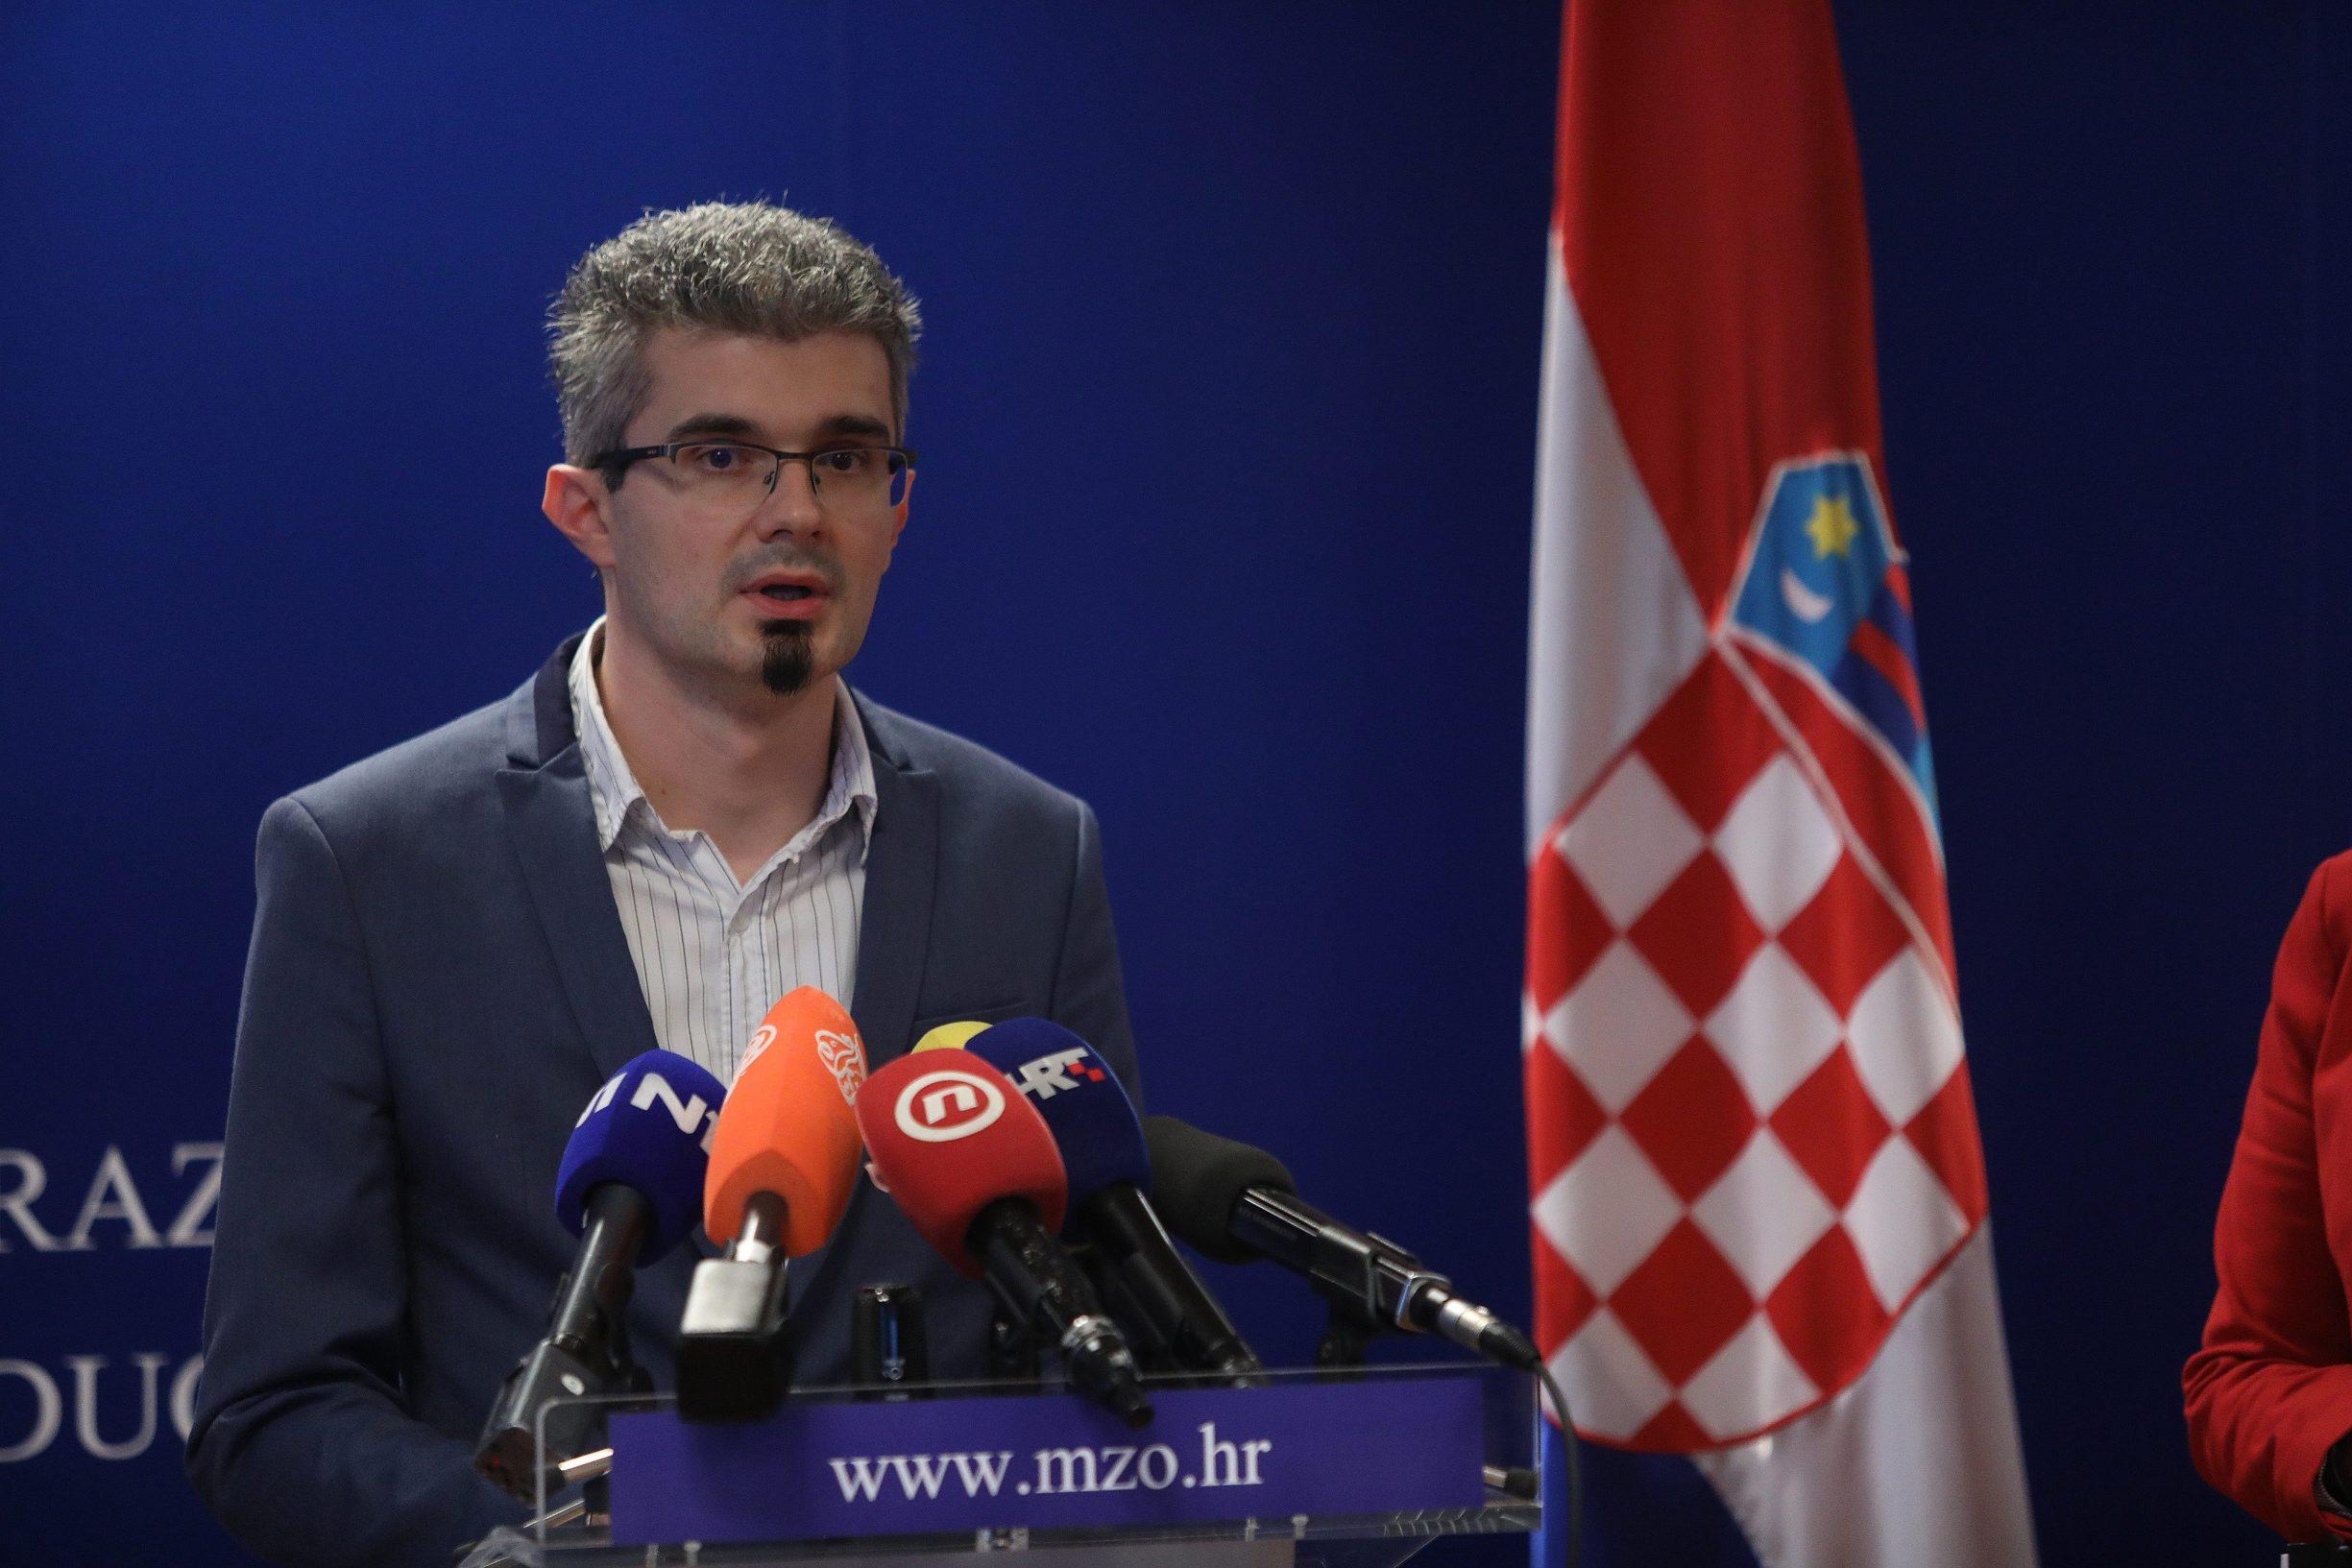 Marko Košiček